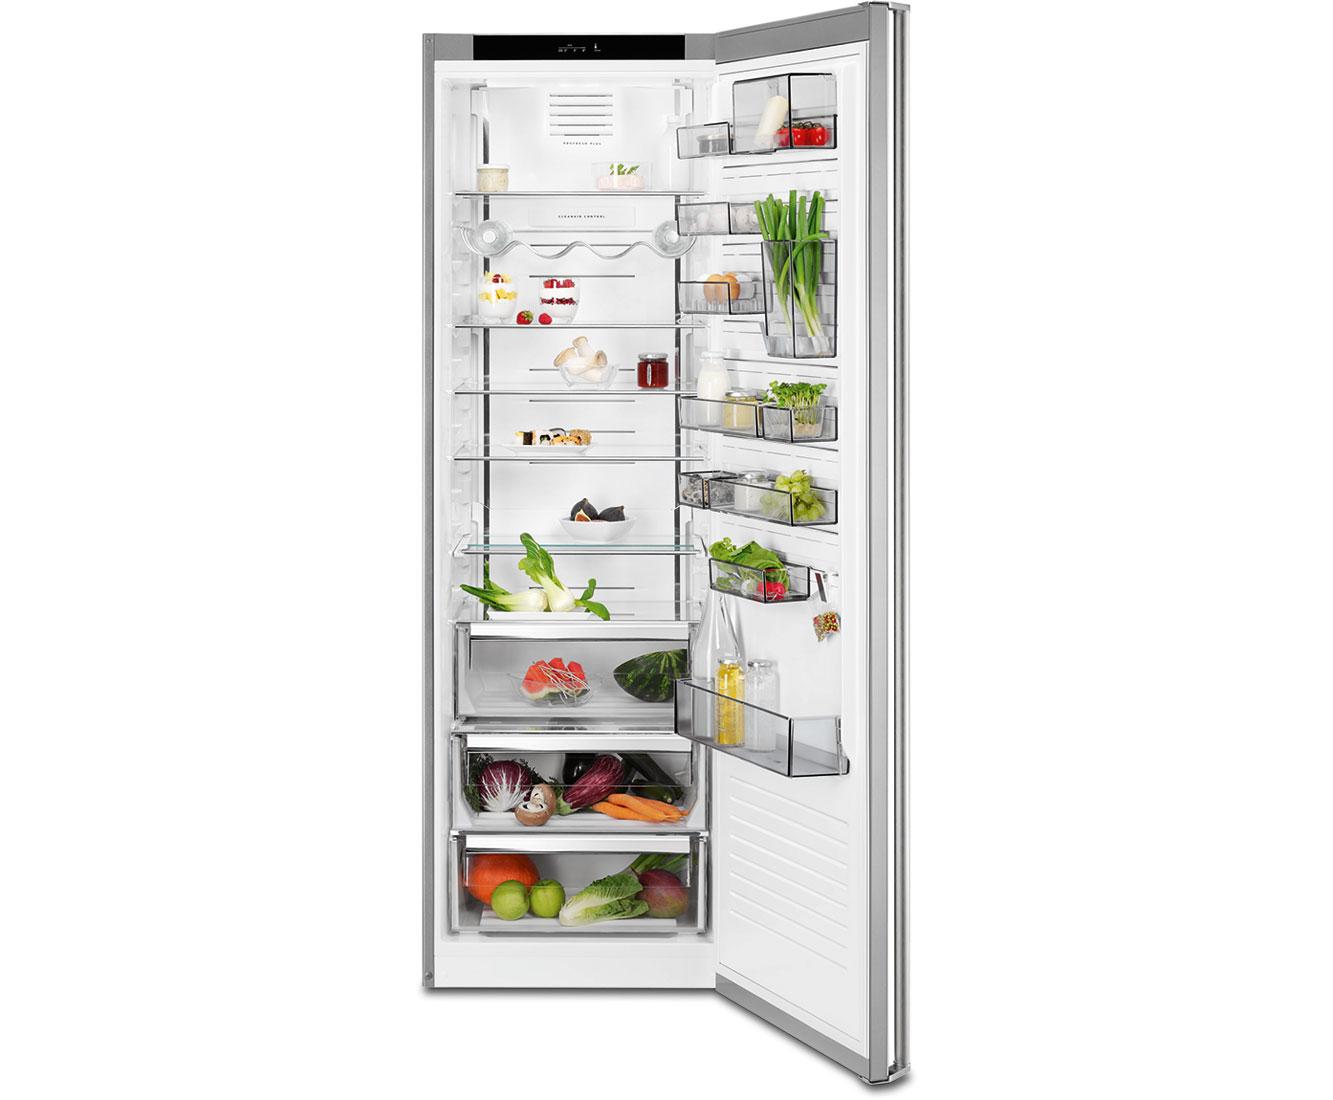 Aeg Kühlschränke Ohne Gefrierfach : Aeg santo rkb mx kühlschrank edelstahl a